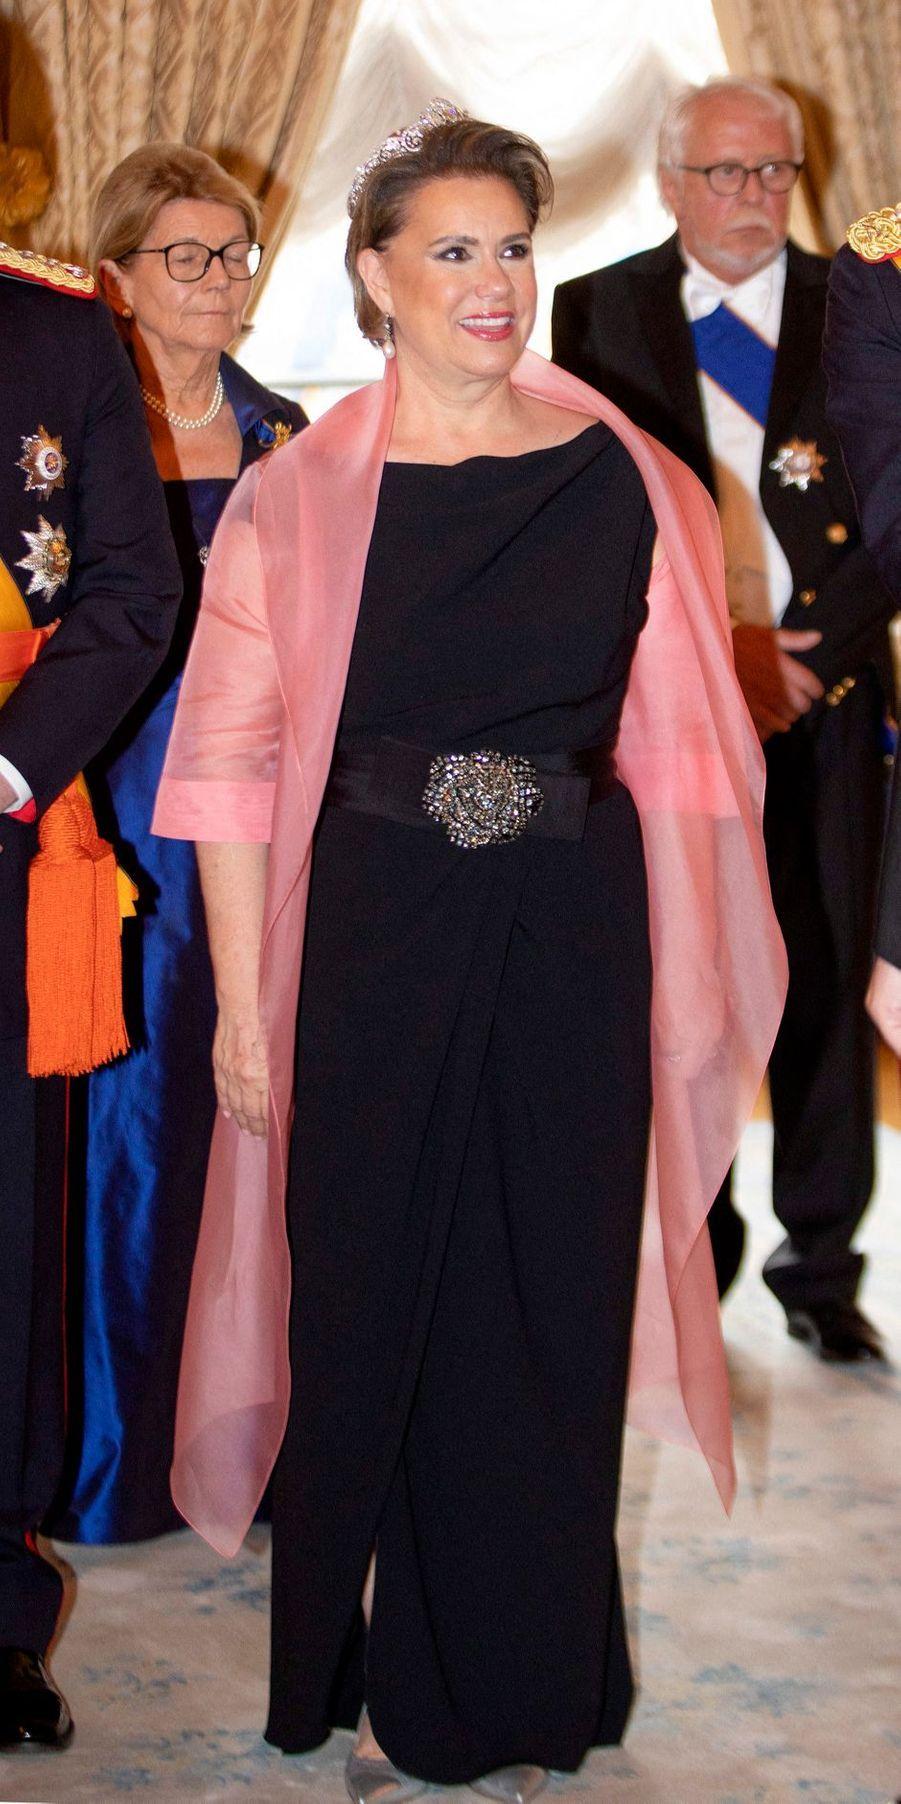 La grande-duchesse Maria Teresa de Luxembourg, le 23 juin 2019 à Luxembourg